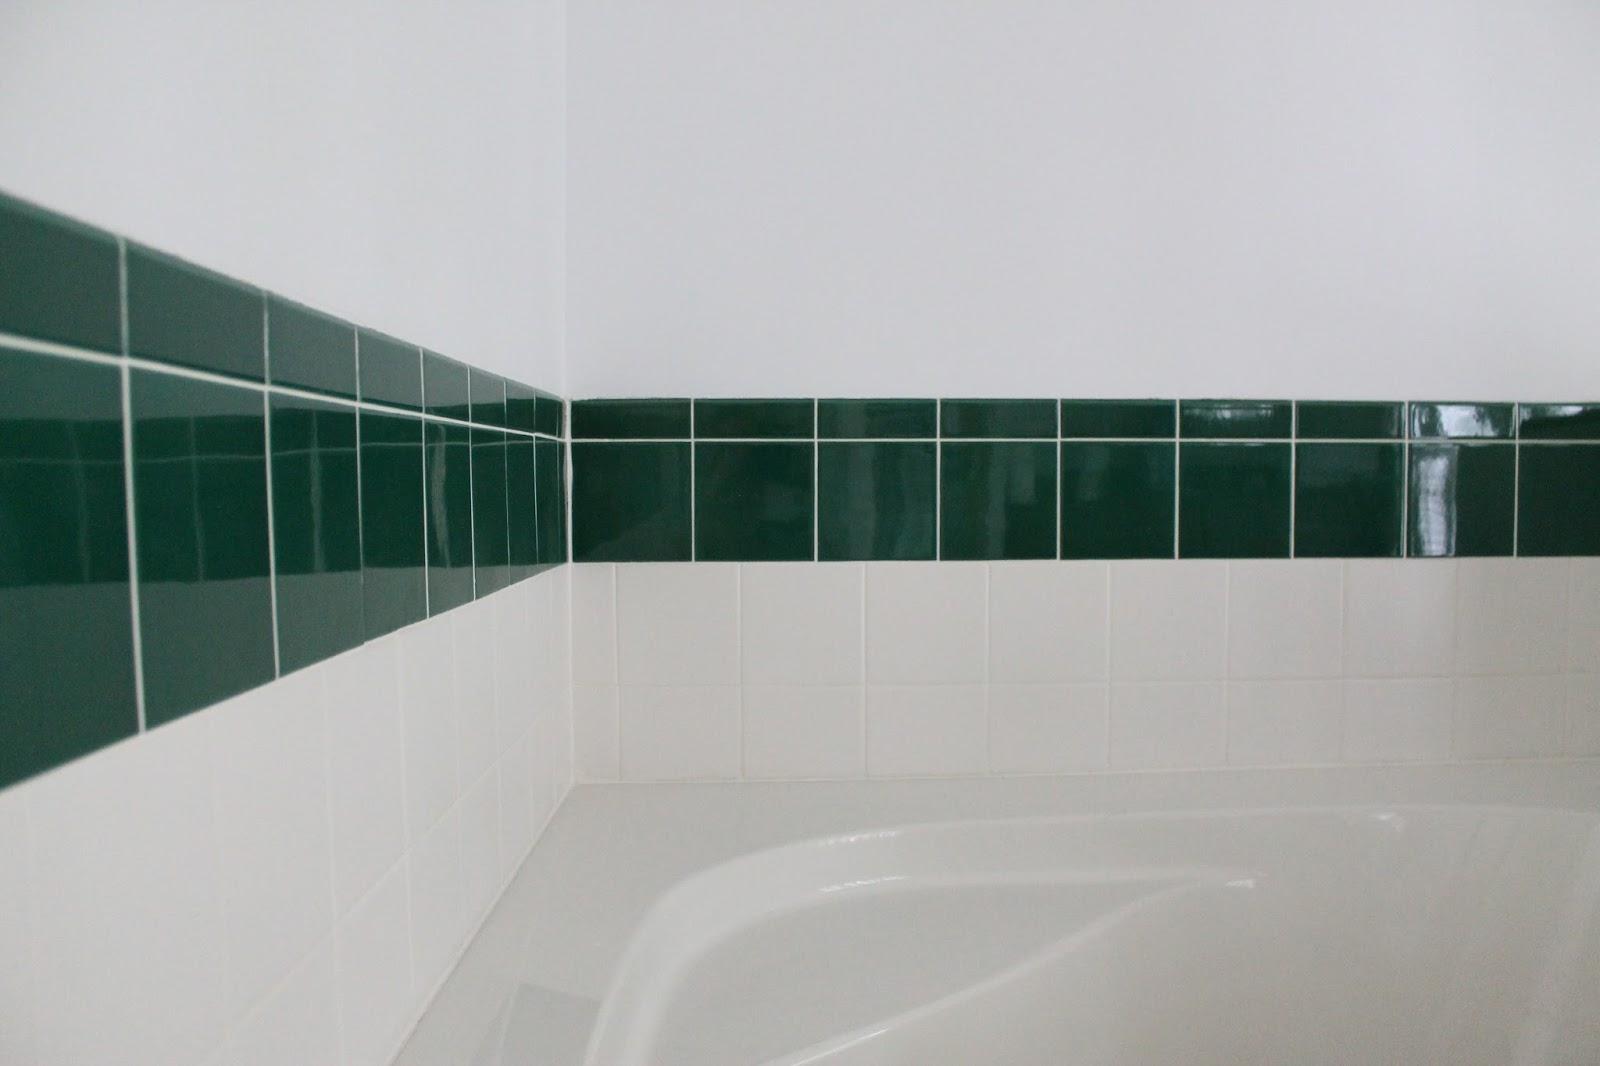 Rubber paint home depot home painting ideas for Bathroom tile paint kit